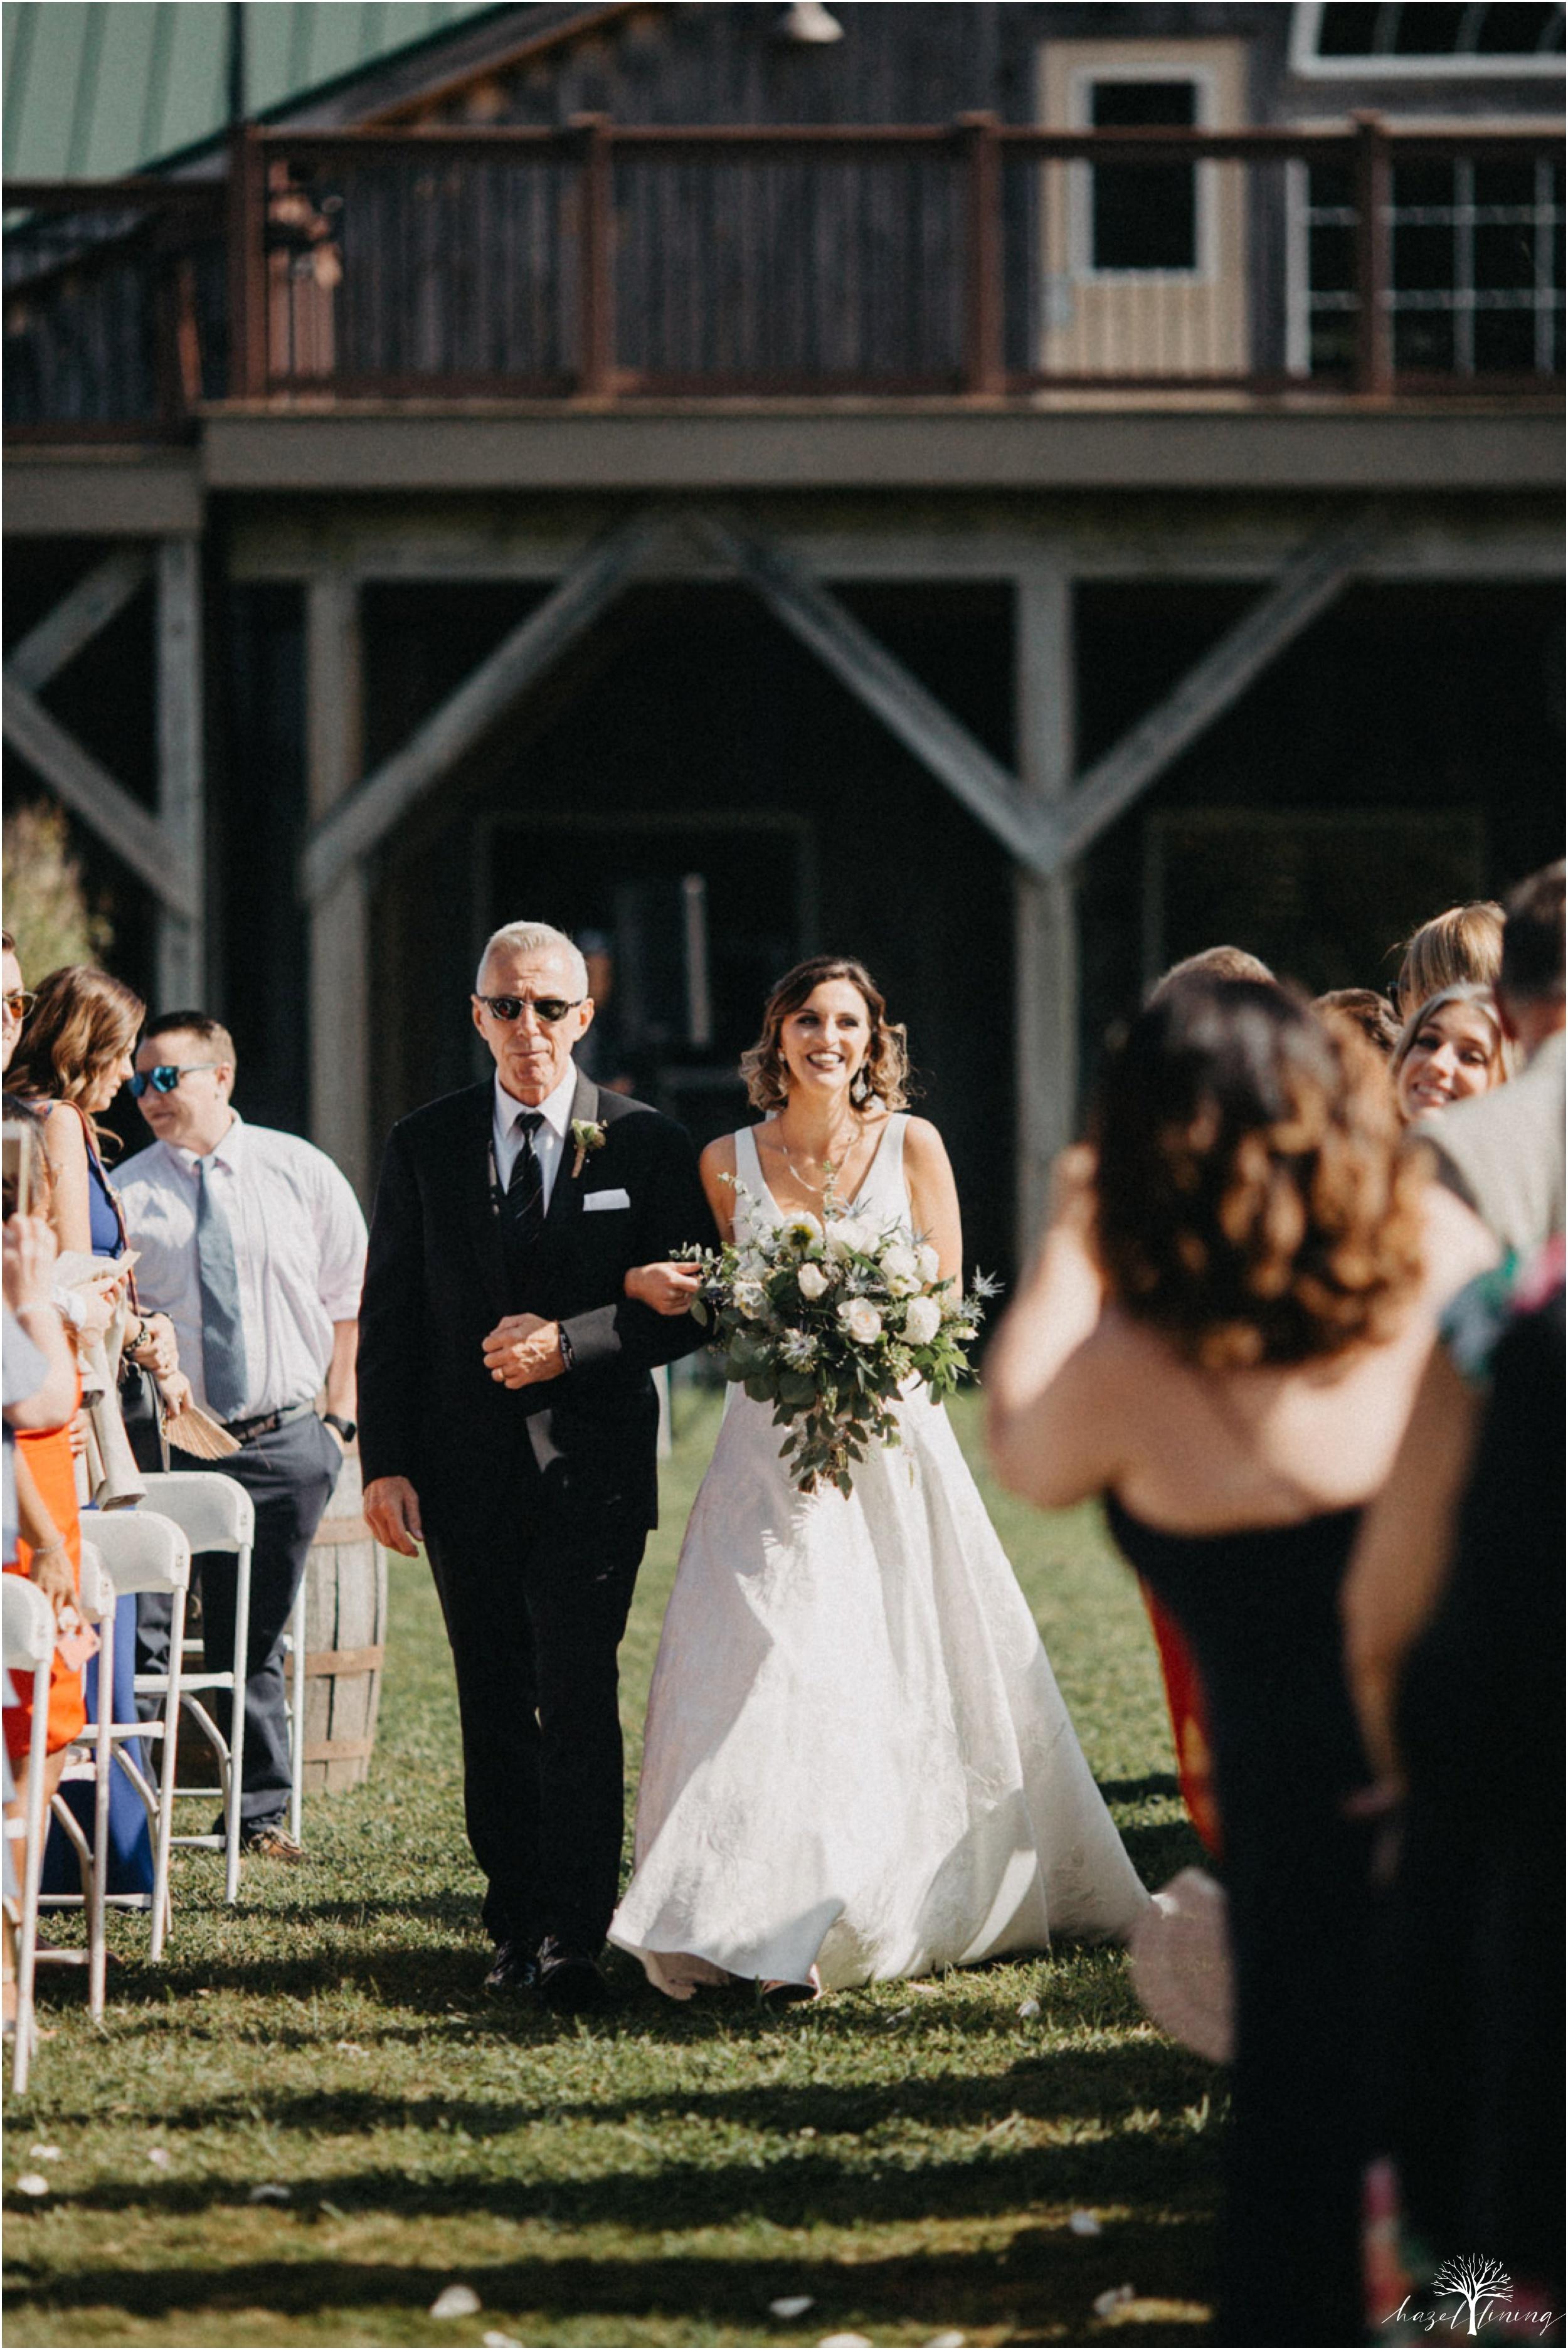 maureen-hepner-anthony-giordano-rose-bank-winery-newtow-pennsylvania-luxury-summer-wedding-hazel-lining-photography-destination-elopement-wedding-engagement-photography_0061.jpg